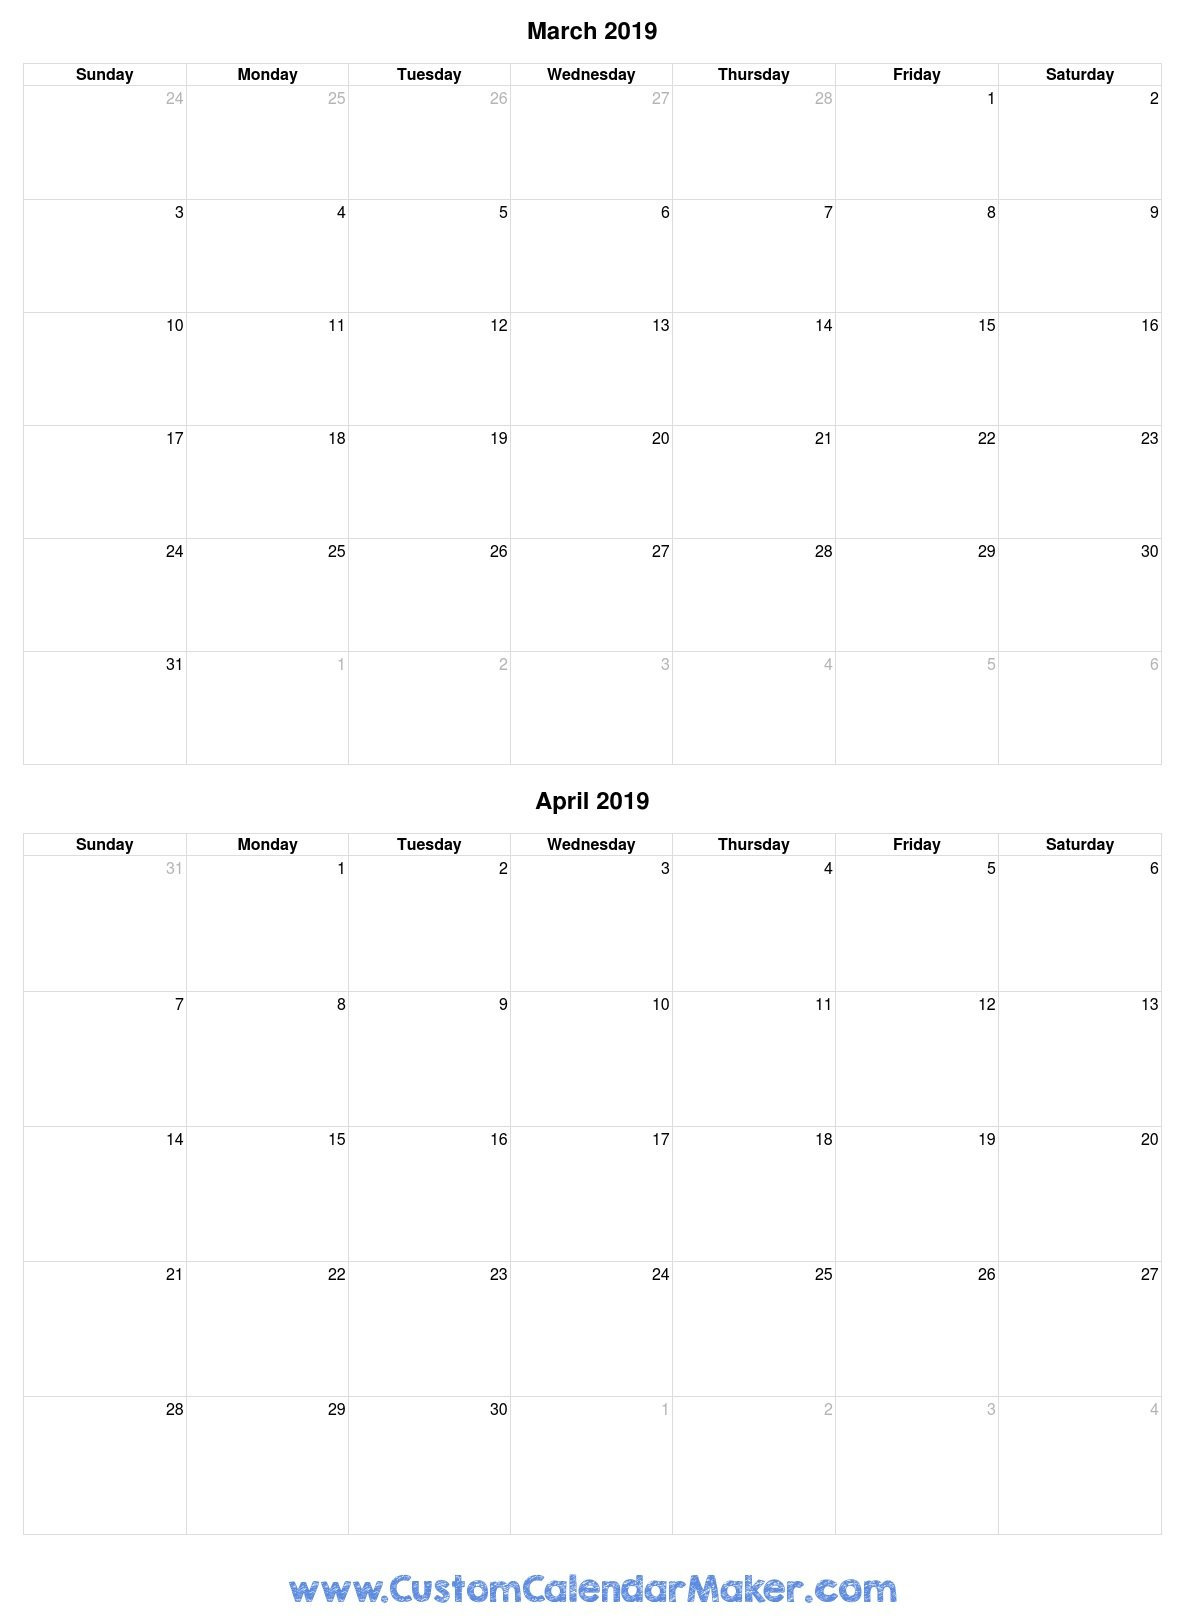 March And April 2019 Free Printable Calendar Template Calendar 2019 March April